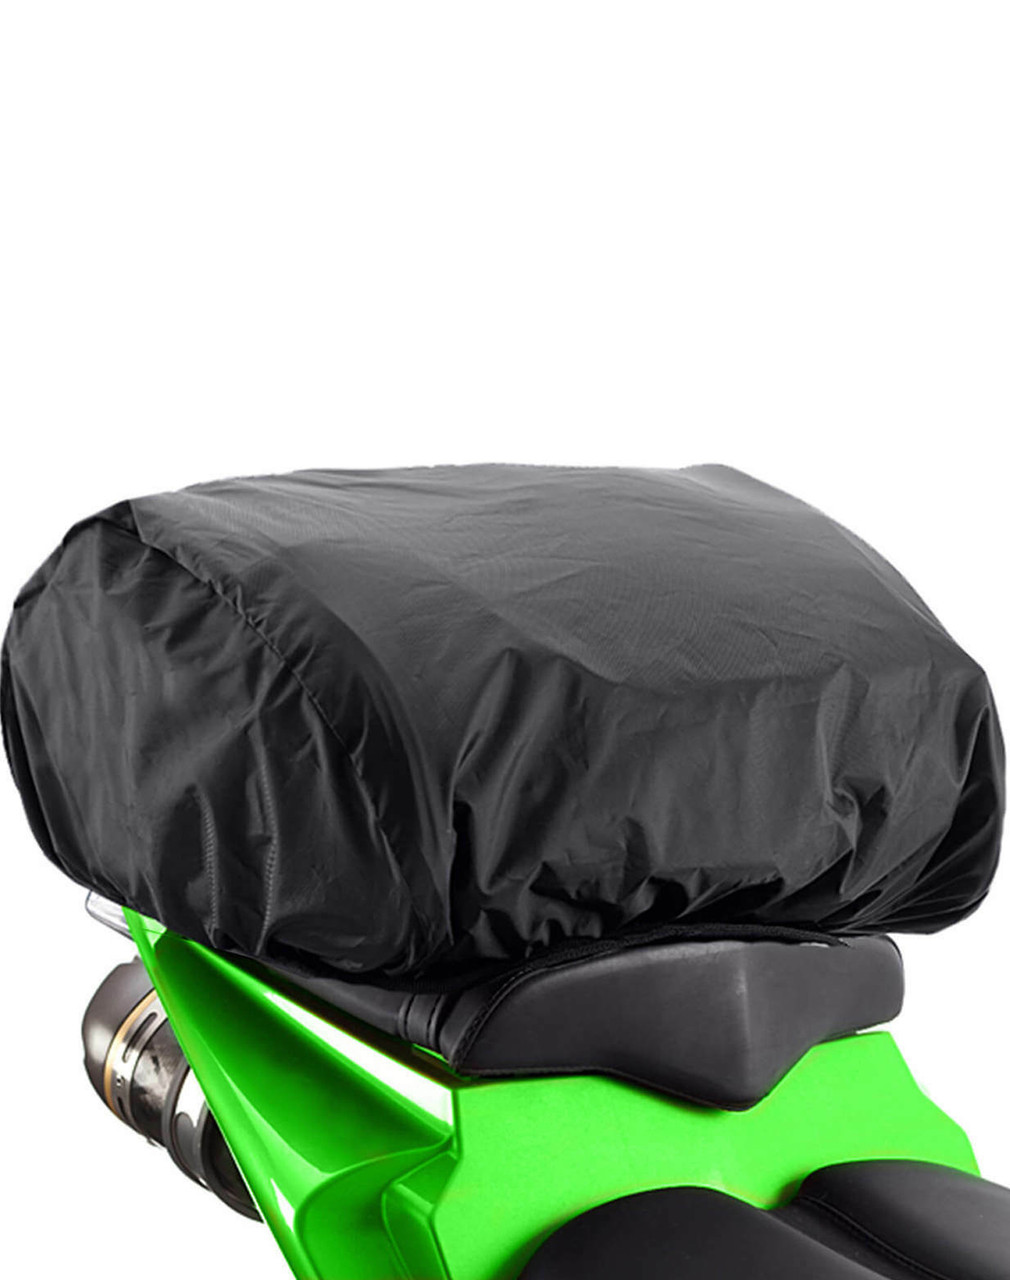 VikingBags Large Kawasaki Motorcycle Tail Bag Rain Cover